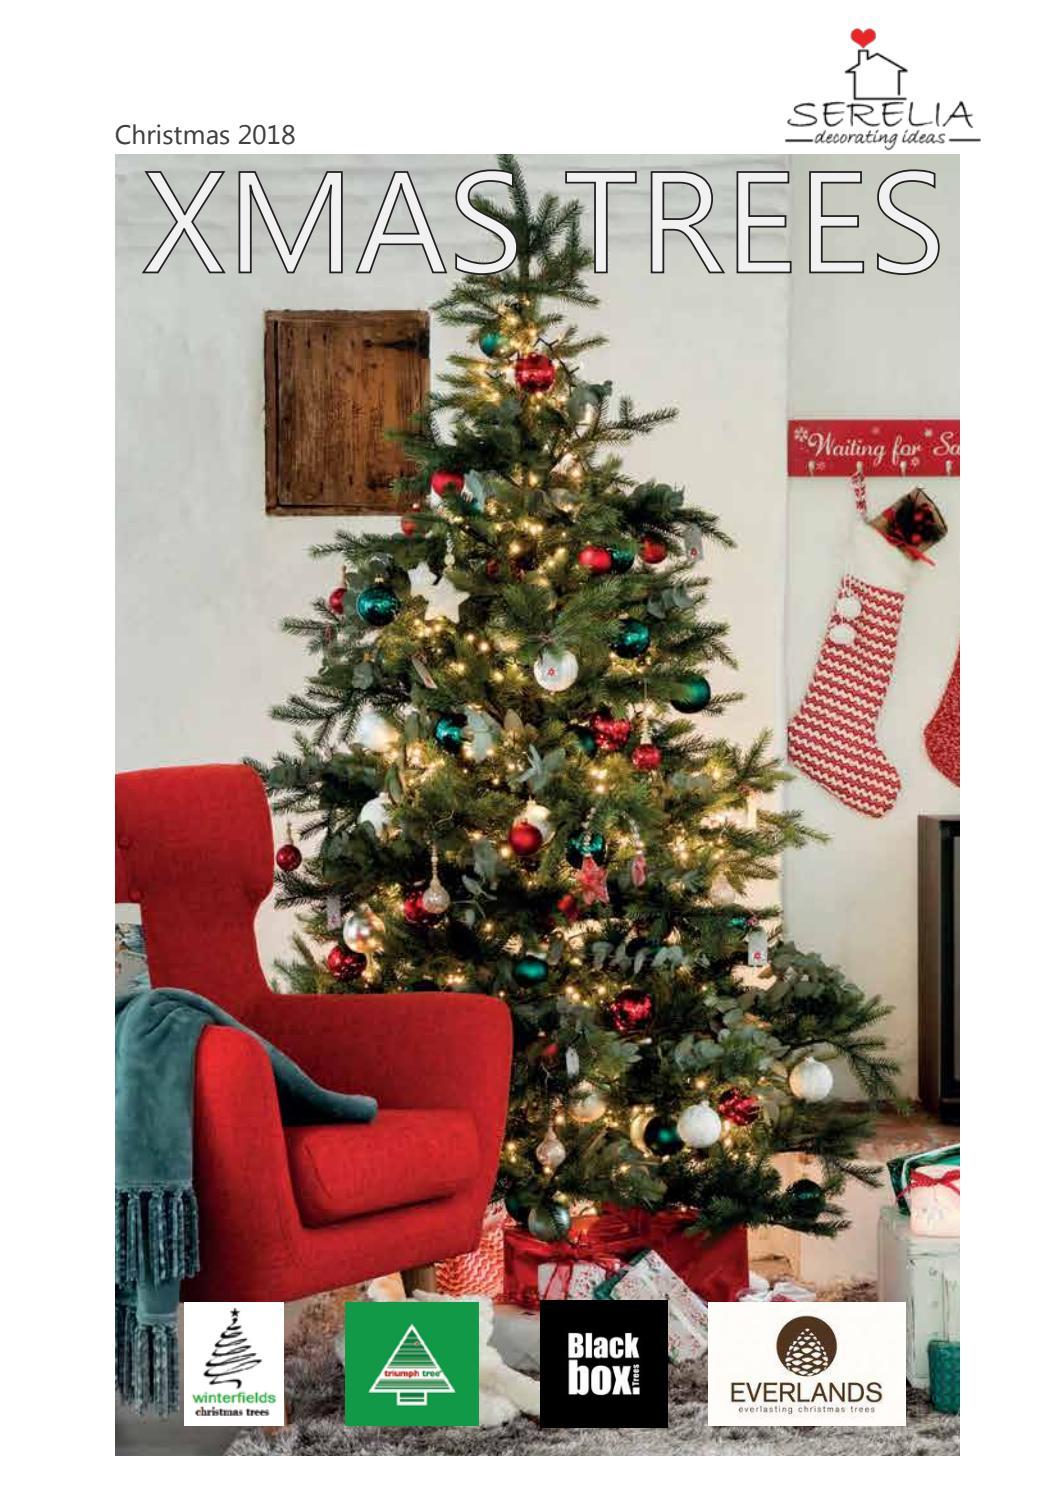 Christmas Trees Catalogue 2018 By Serelia Decorating Ideas Issuu